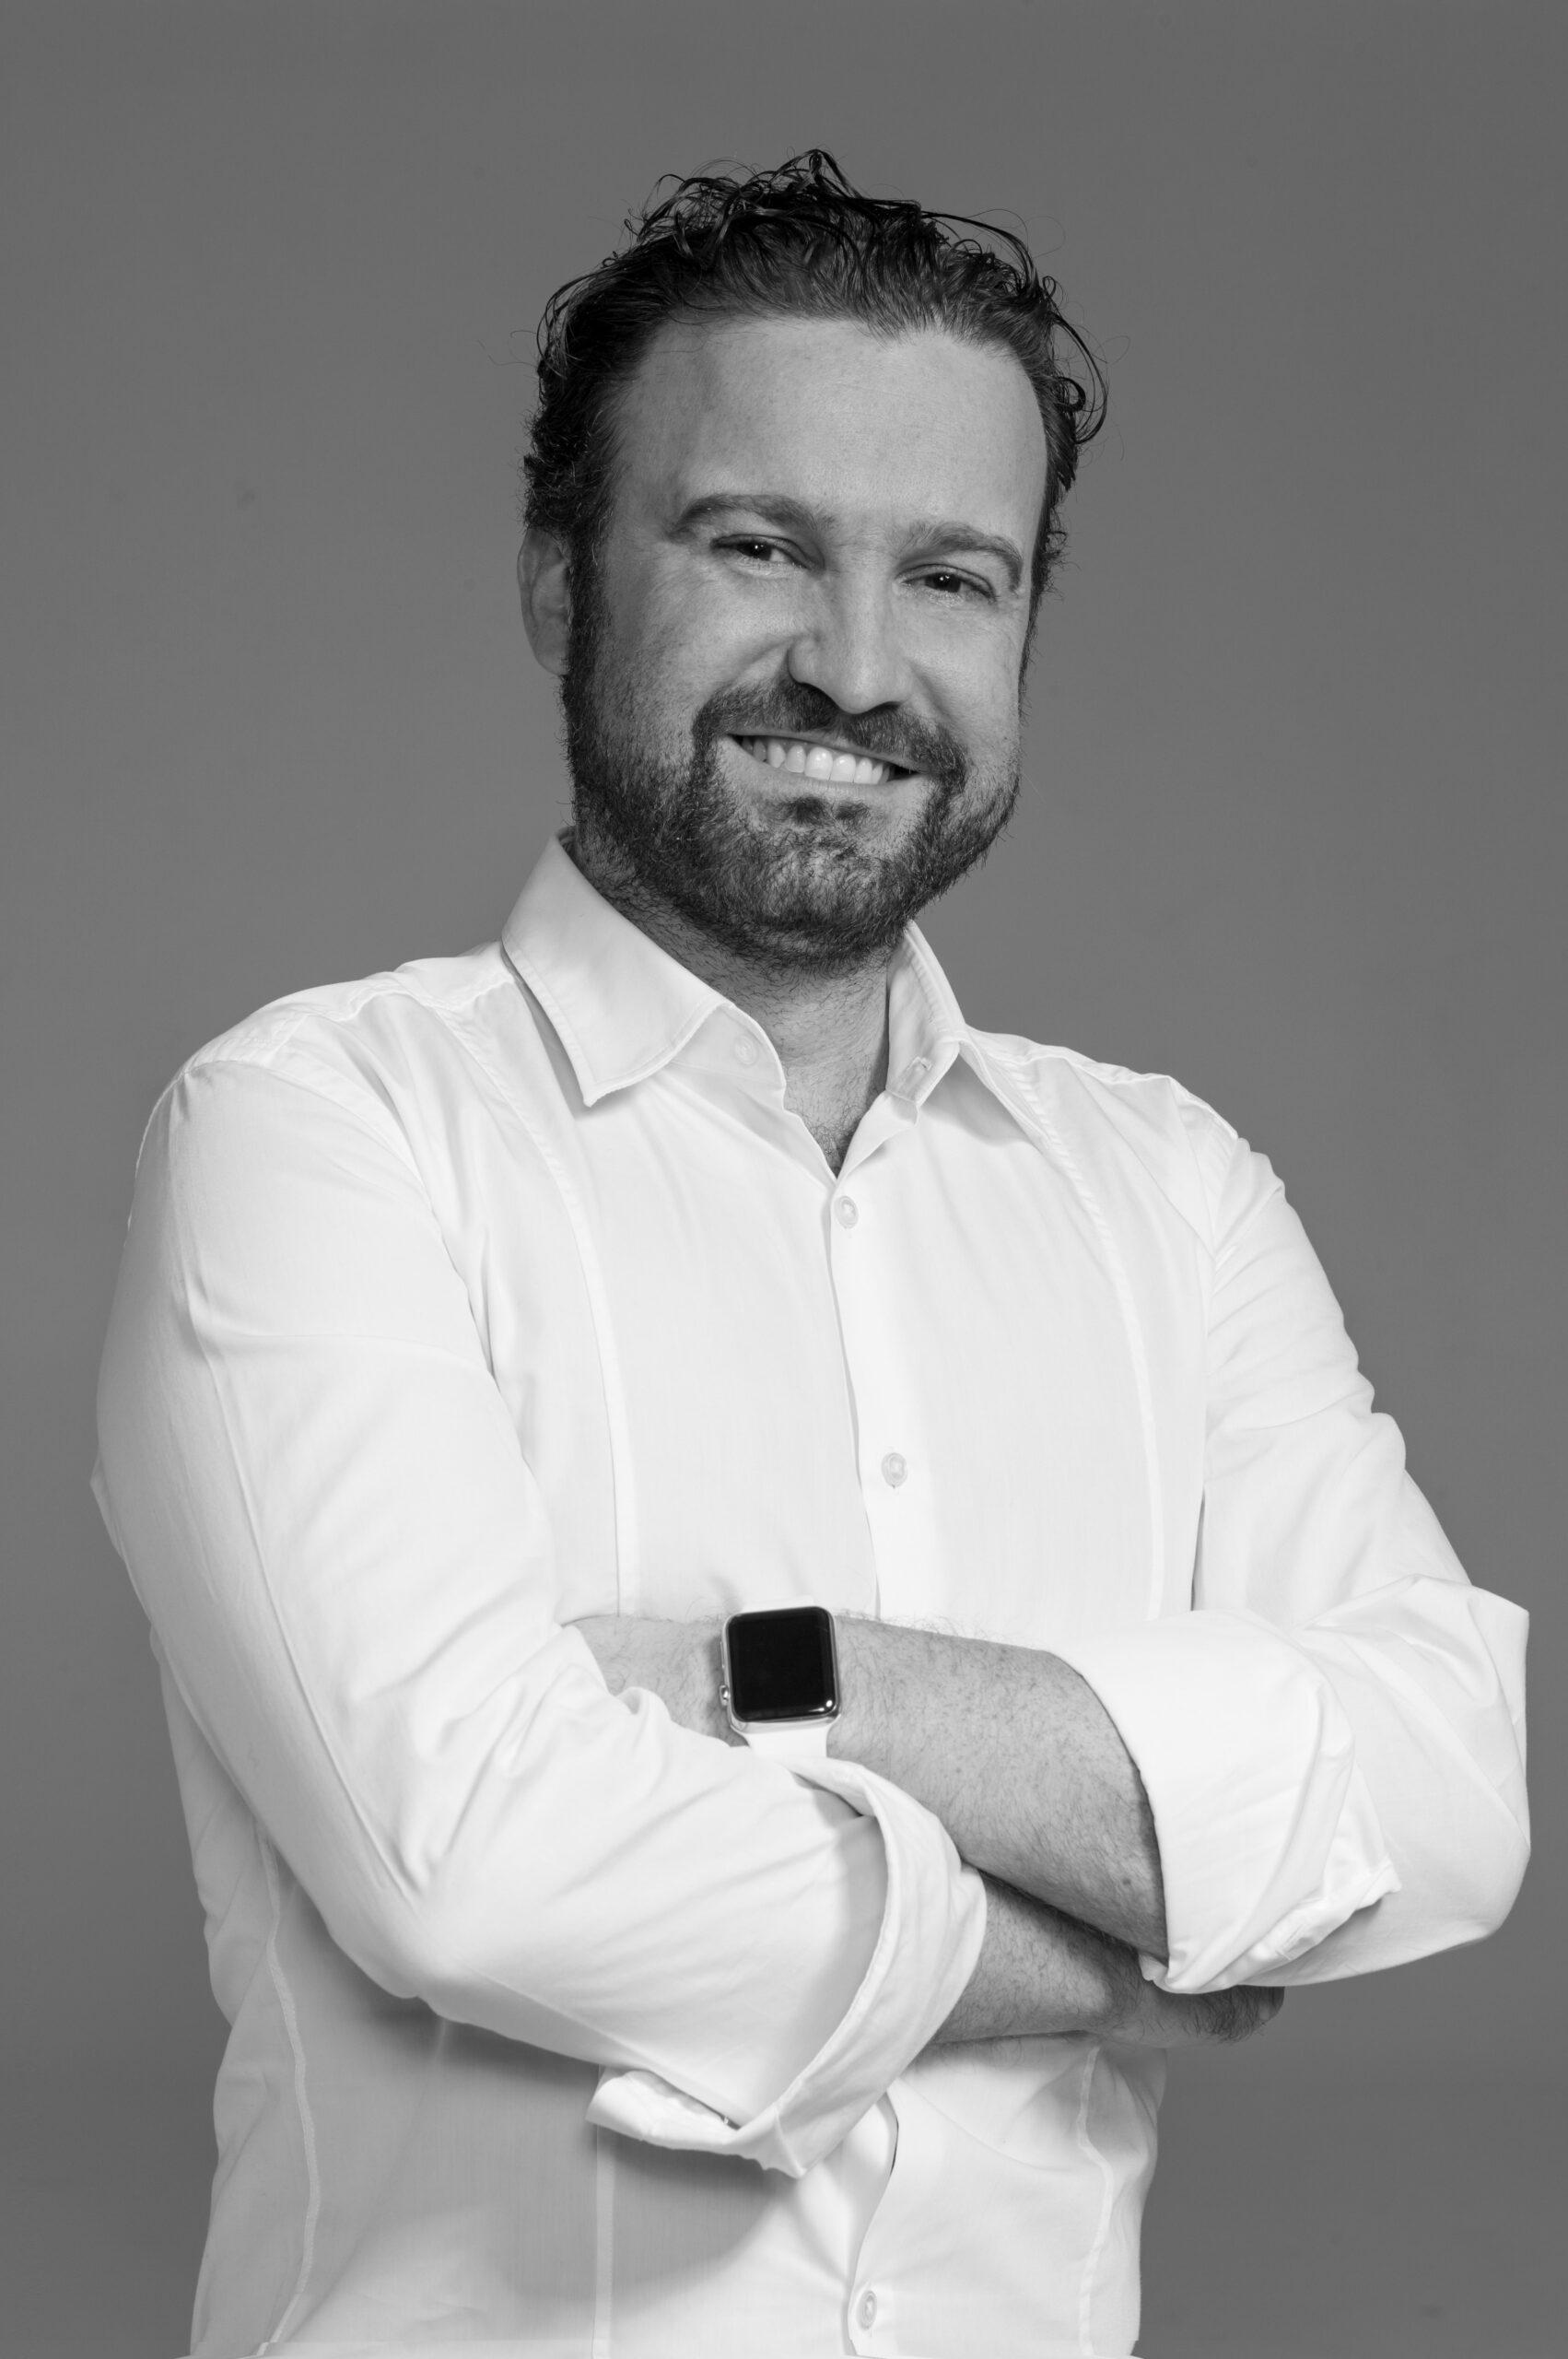 Manuel Roman Jimenez